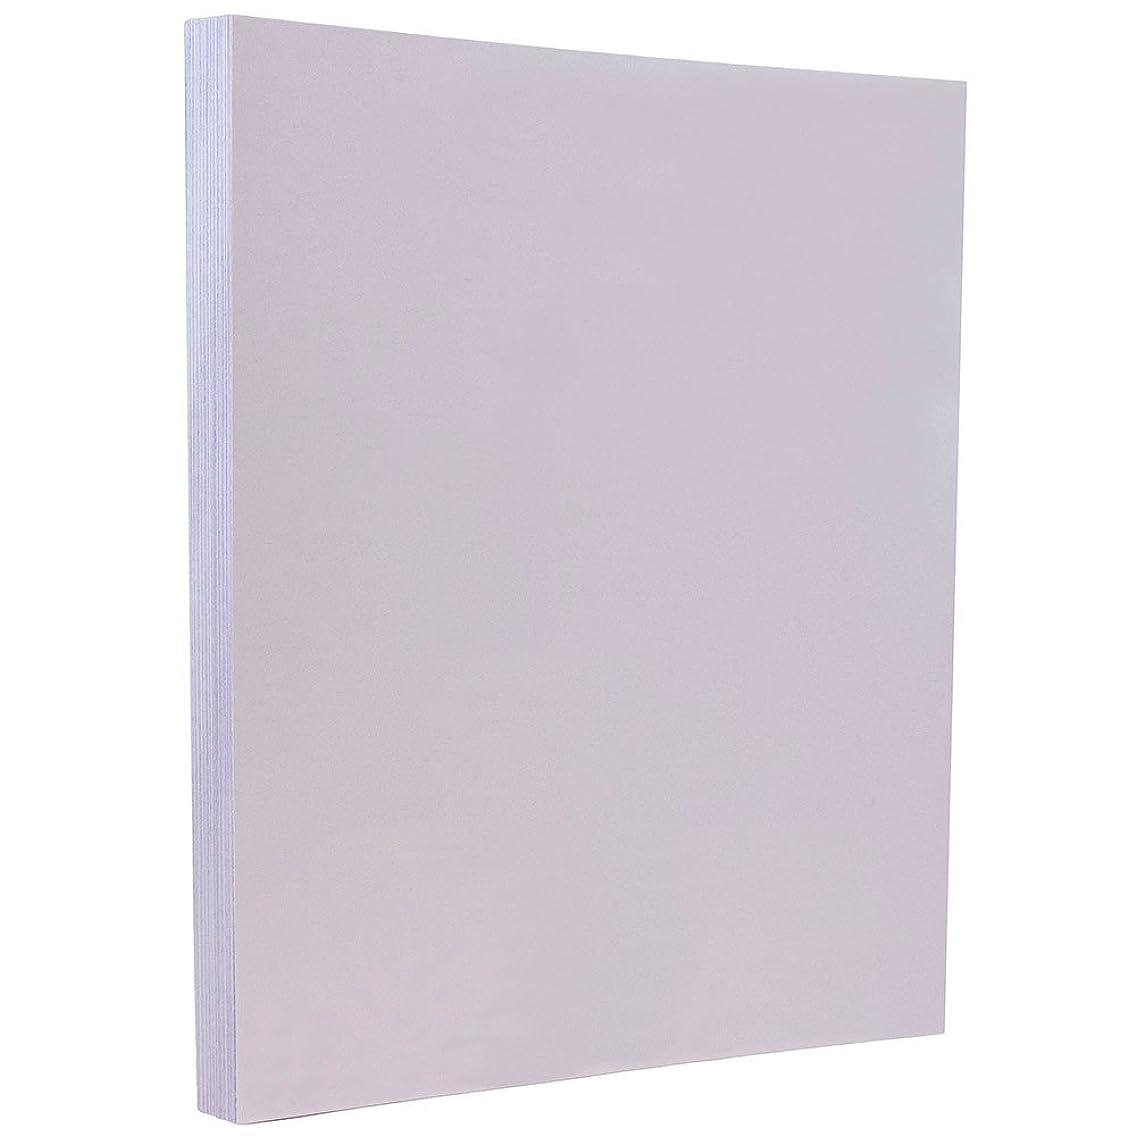 JAM PAPER Vellum Bristol 67lb Cardstock - 8.5 x 11 Coverstock - Orchid Light Purple - 50 Sheets/Pack